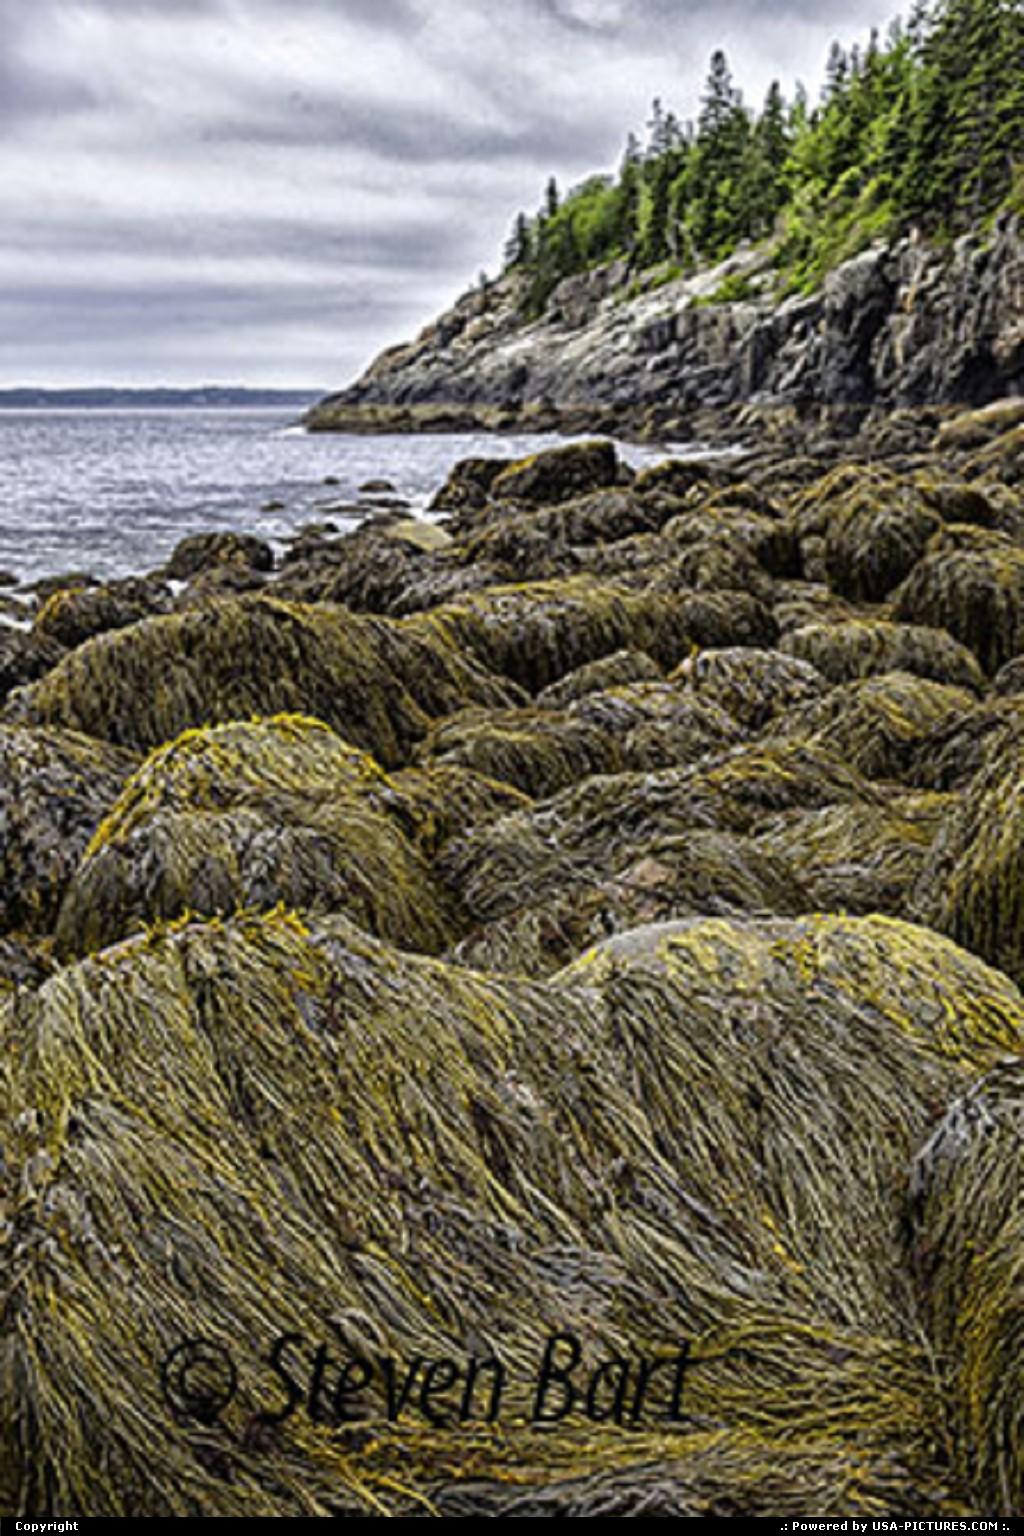 Picture by Steve Bart:Bar HarborMaineHunter Beach, Acadia National Park